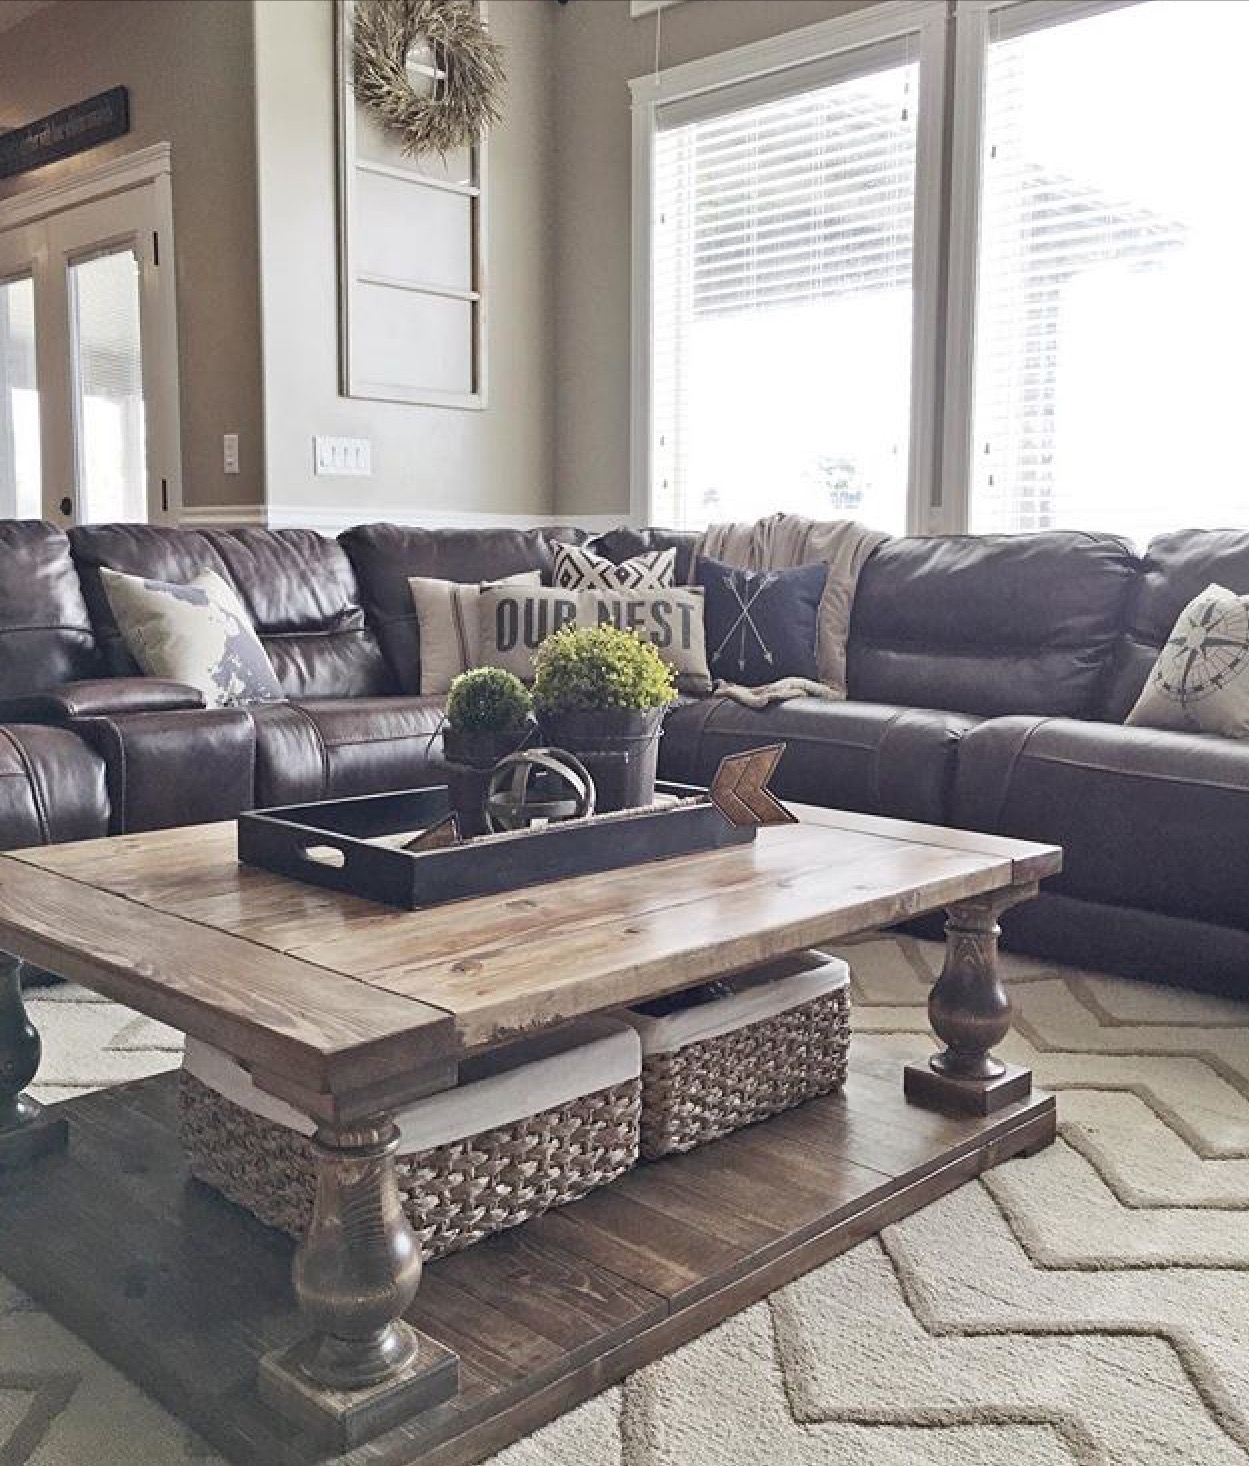 Leather Sofa With Throw Pillows Rug Home Decor Living Room